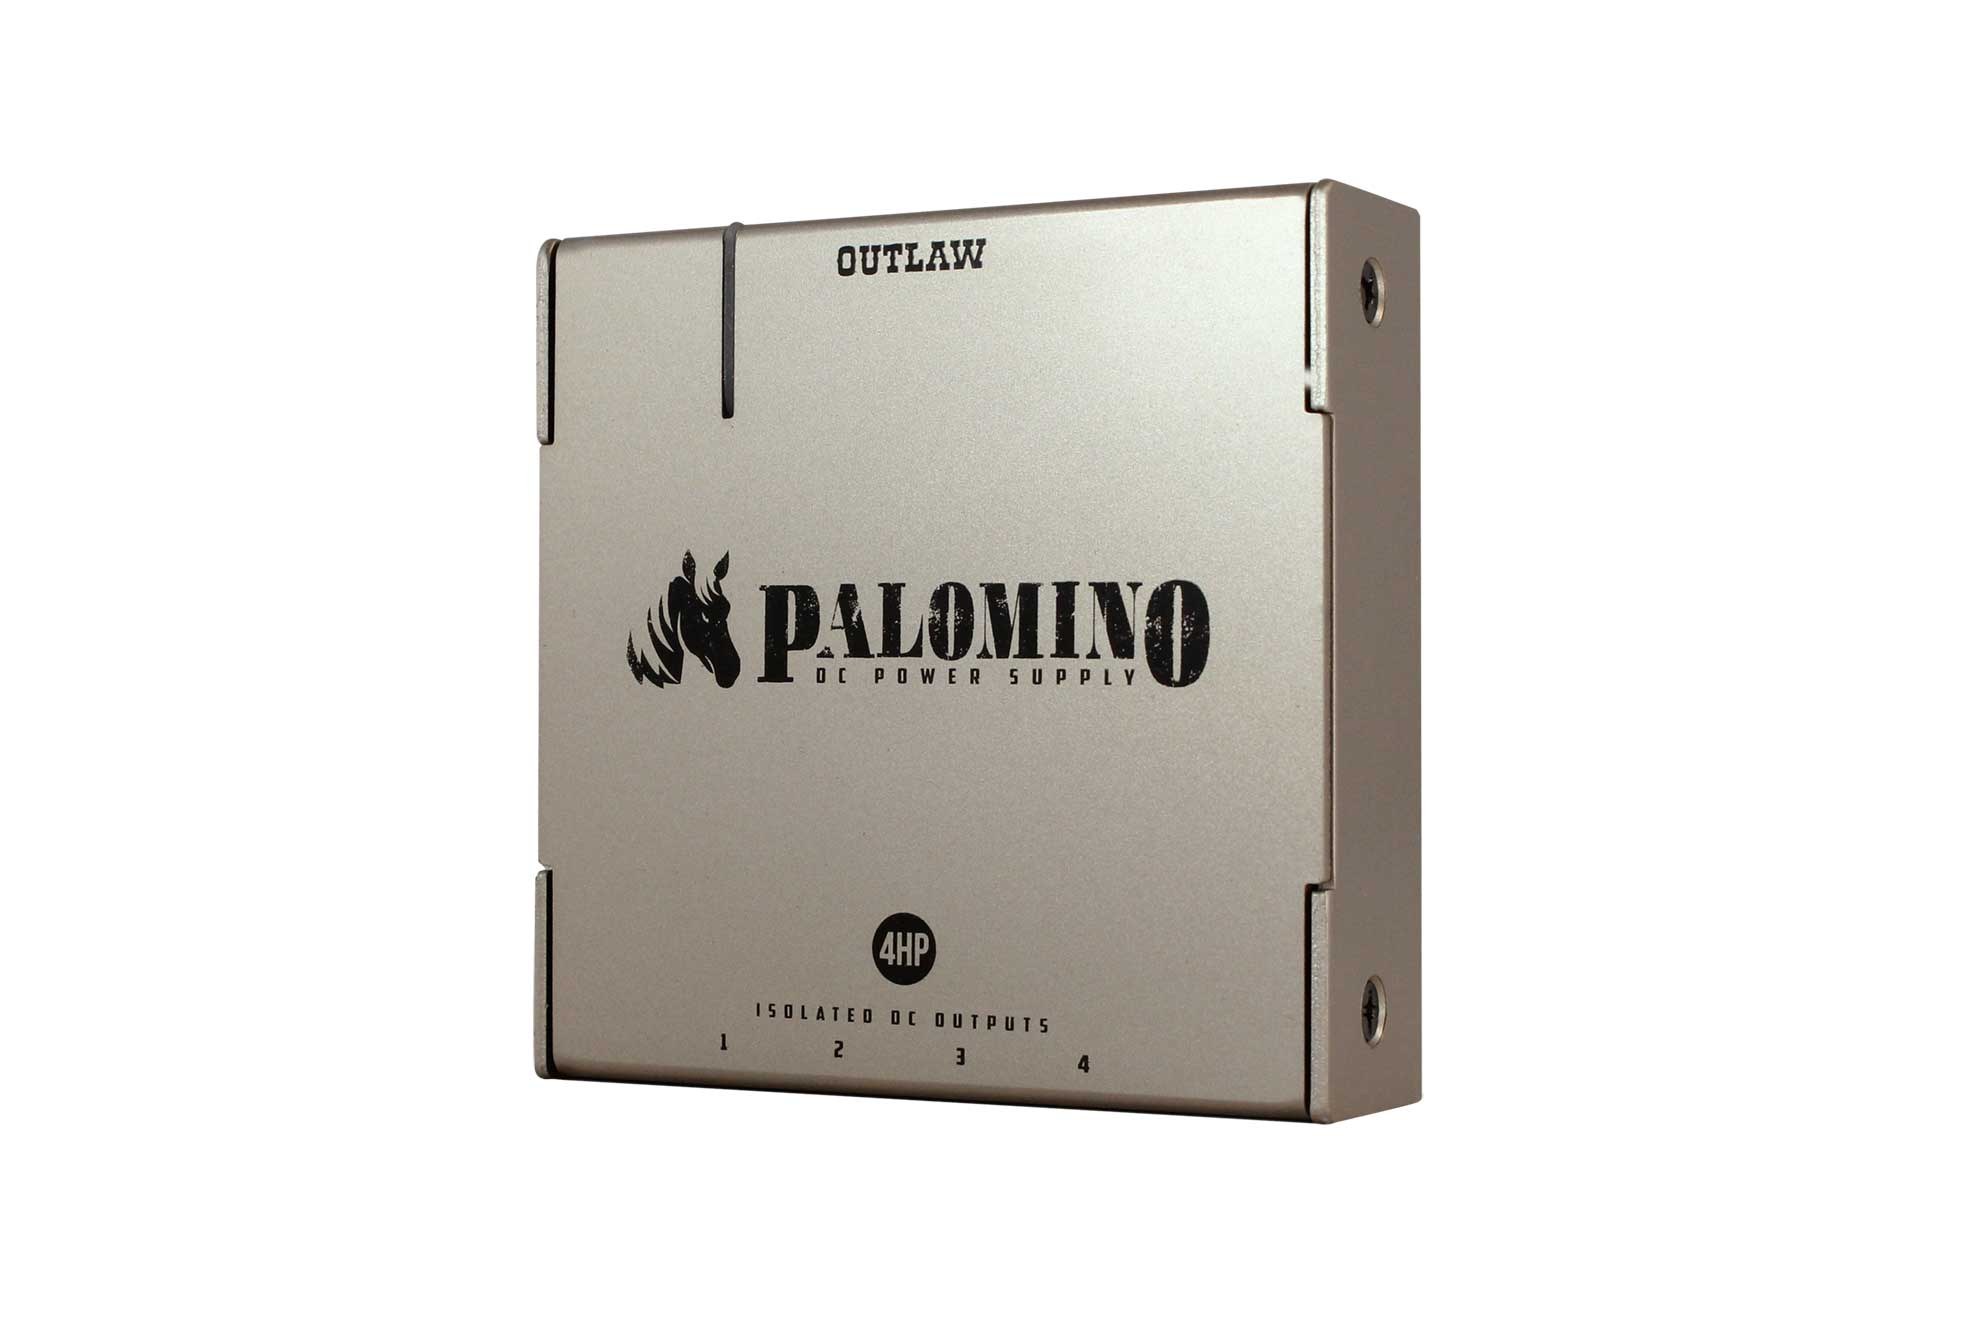 PALOMINO-4HP_angled4.jpg